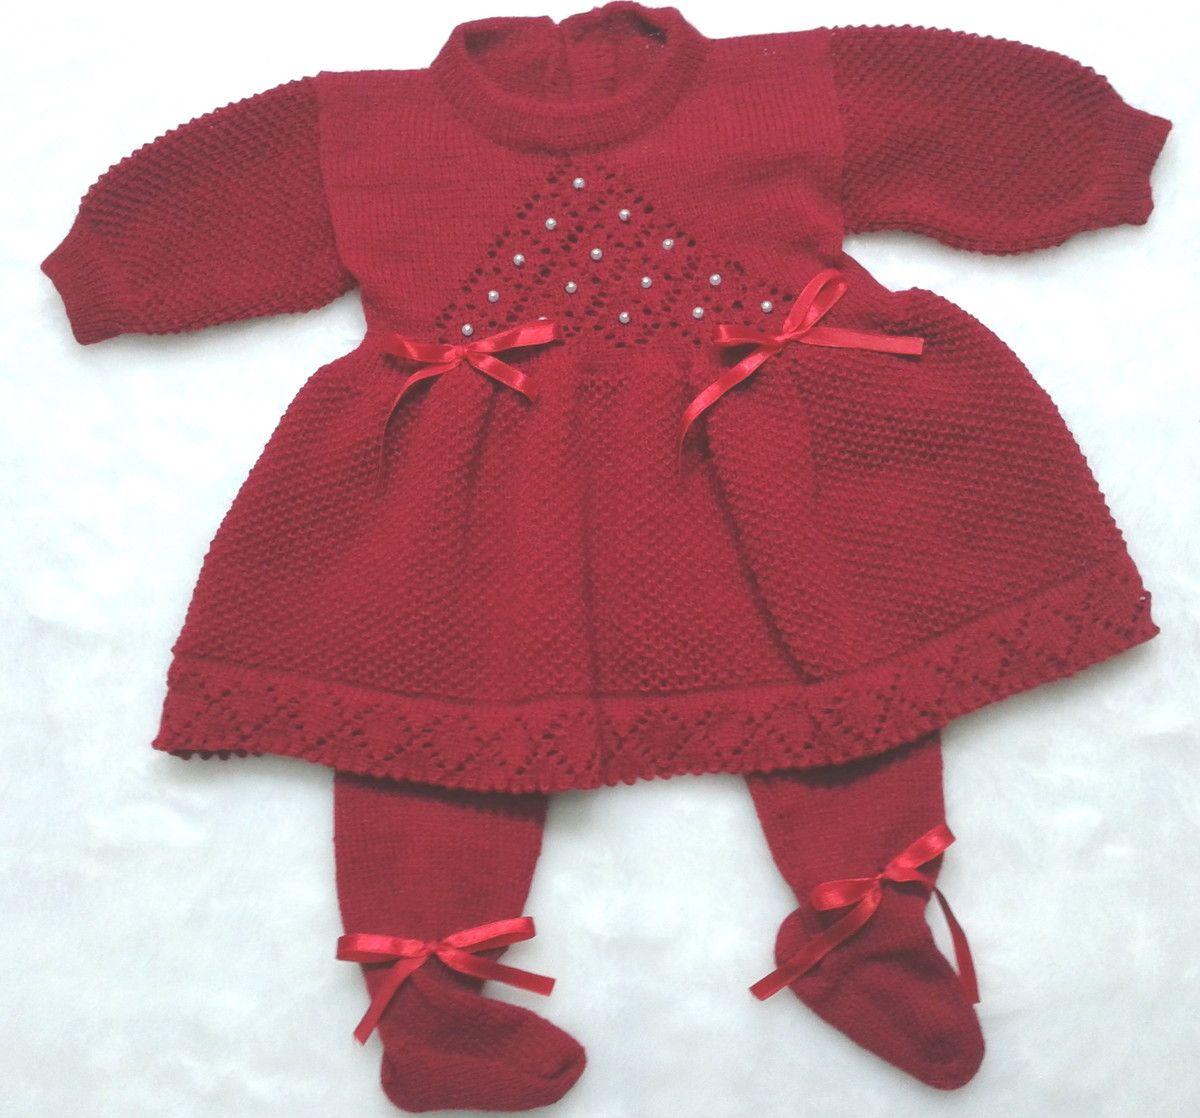 ee77127aea Saída Maternidade Batizado Vestido Calça